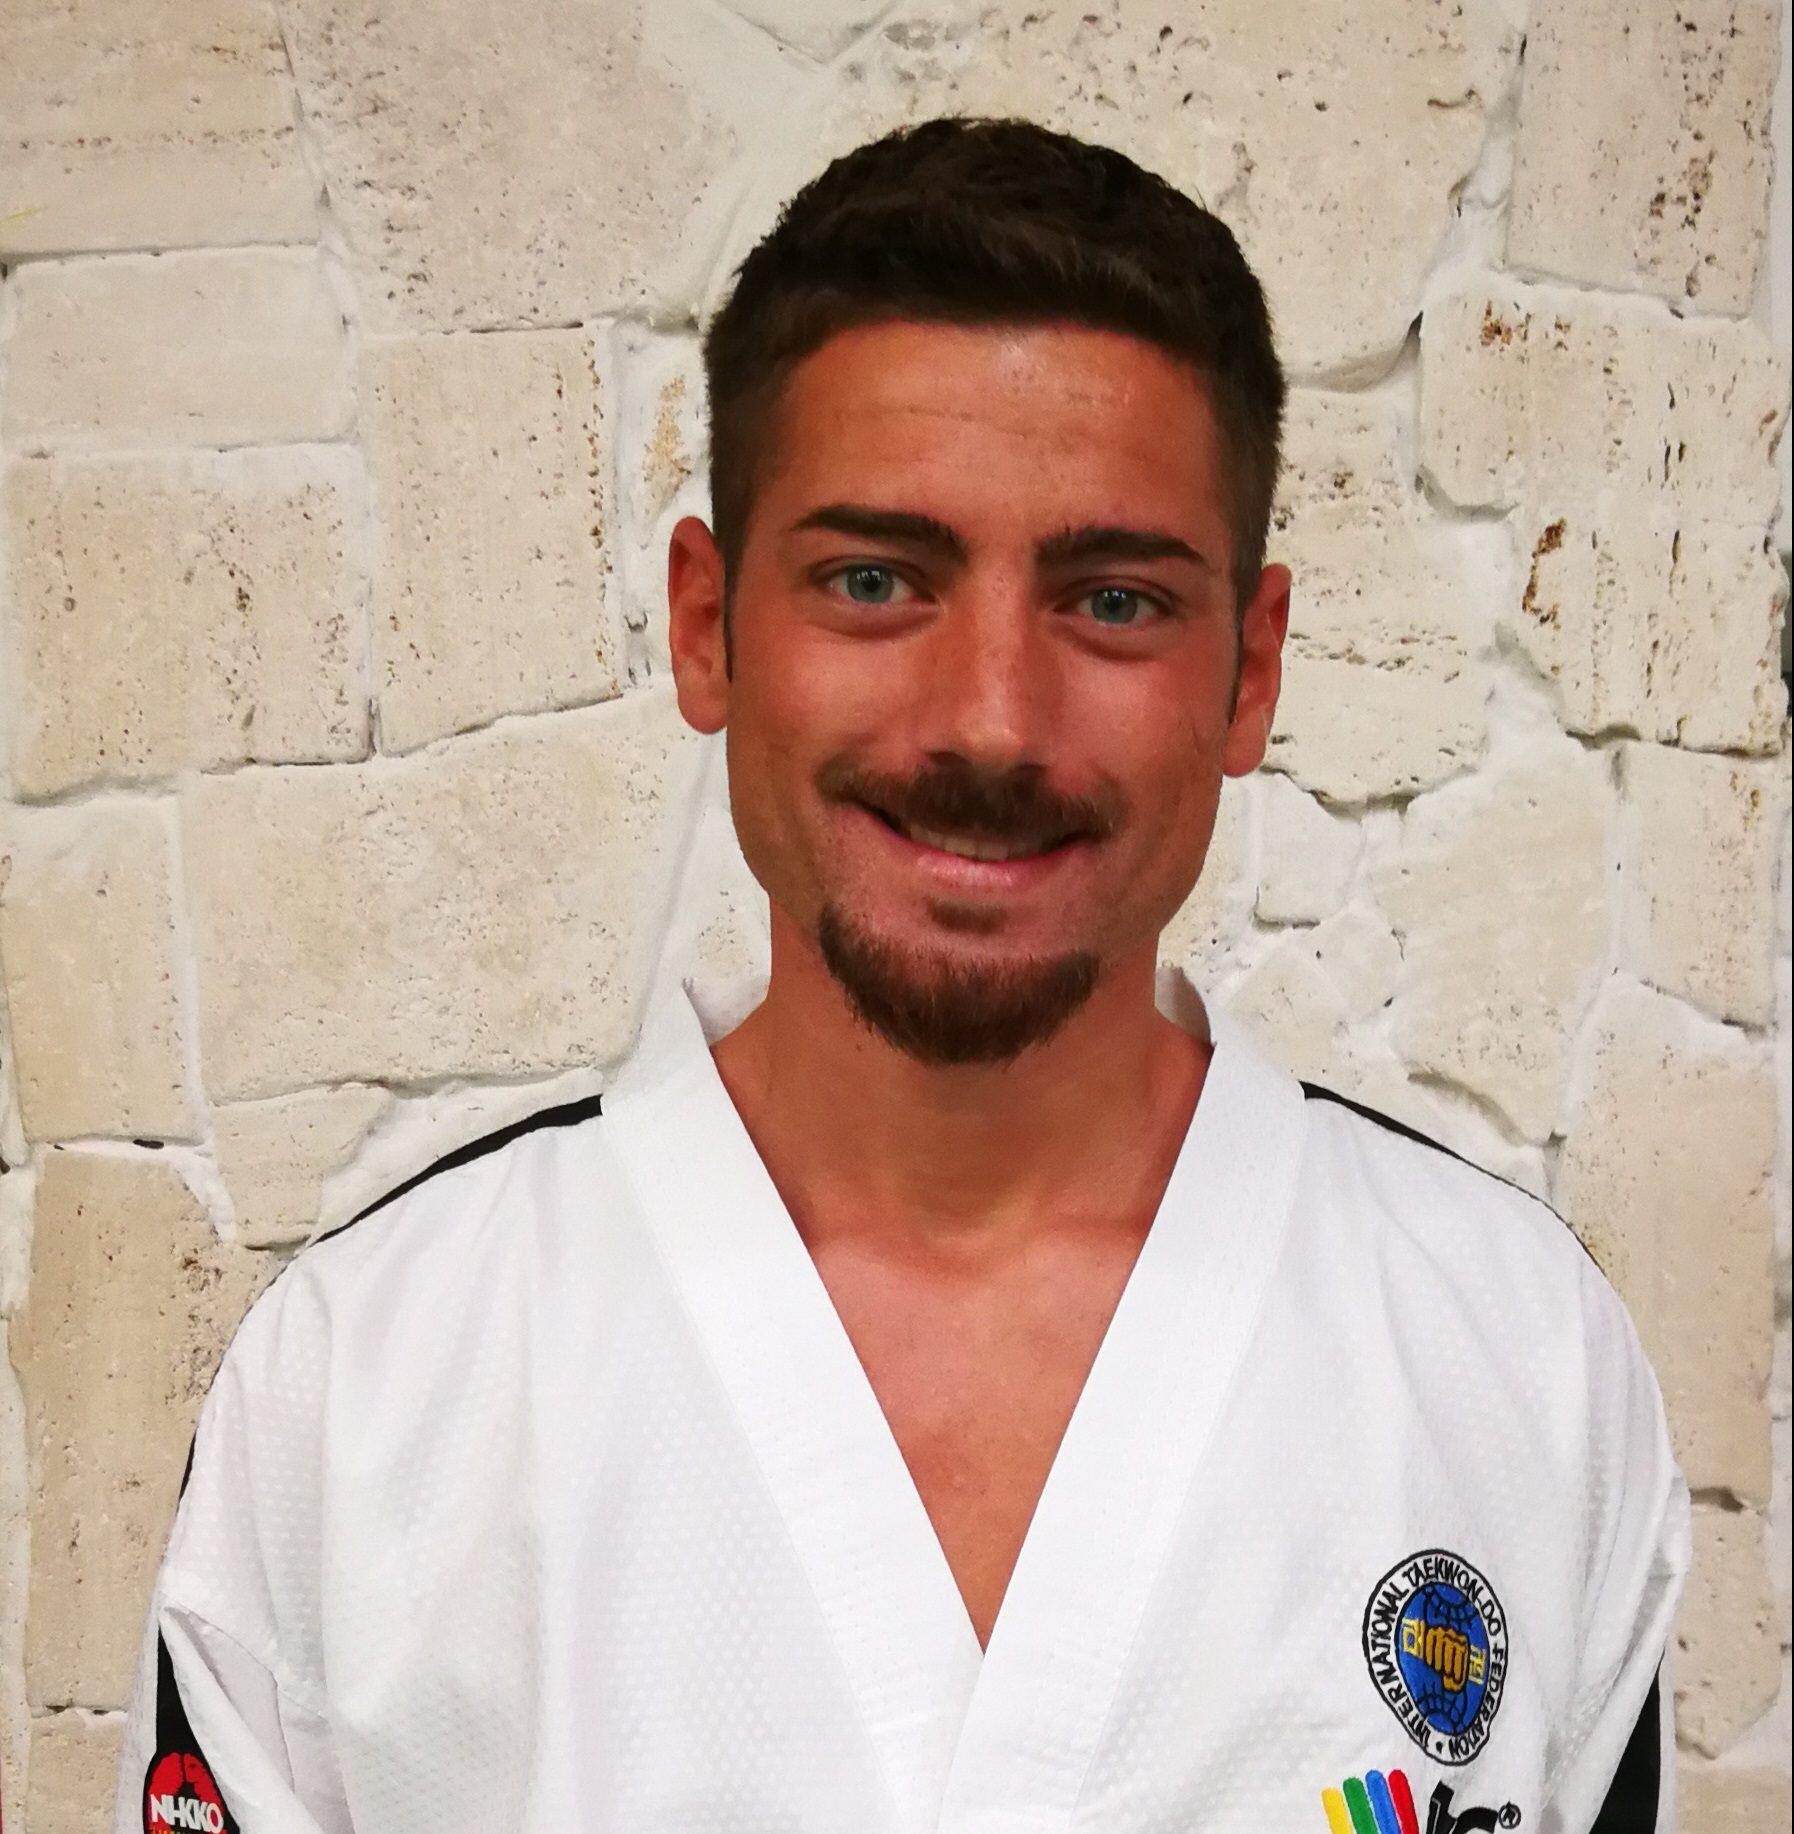 Matteo Coppola